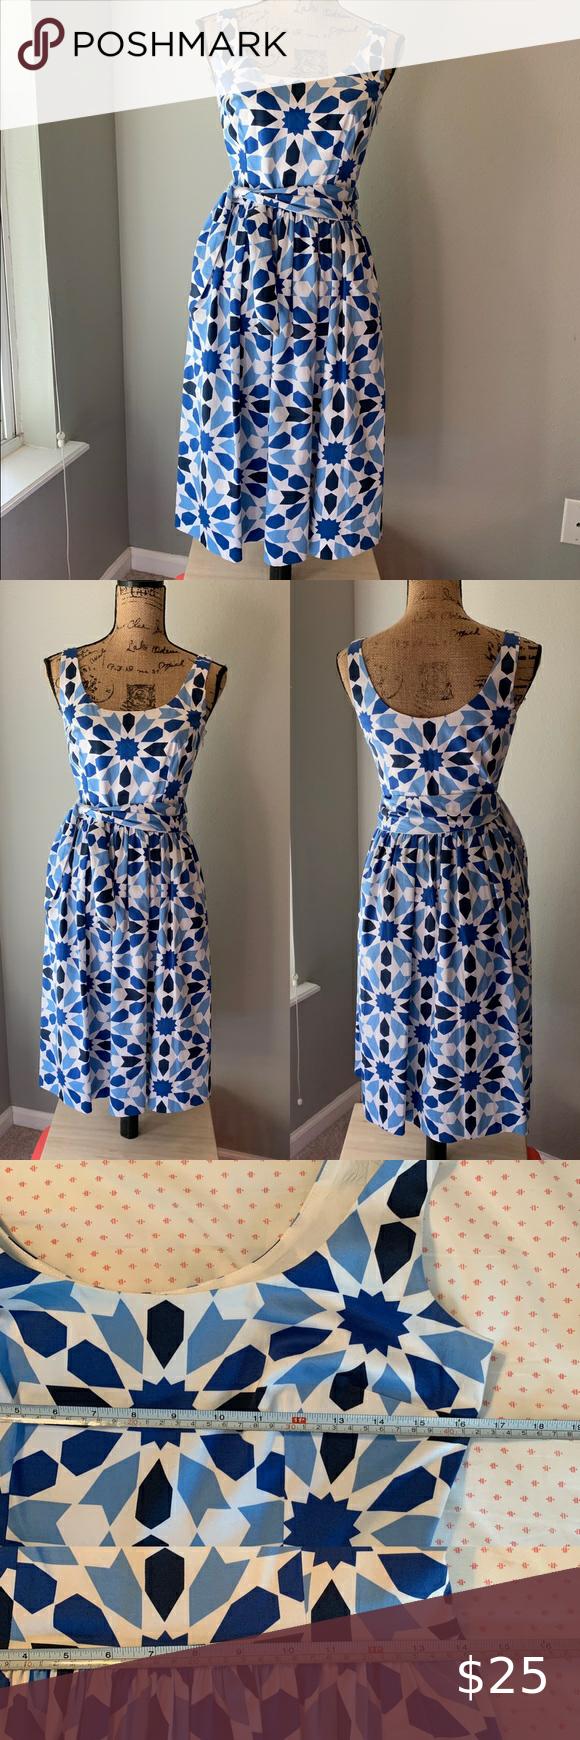 Maggy London sz 4 kaleidoscope print dress